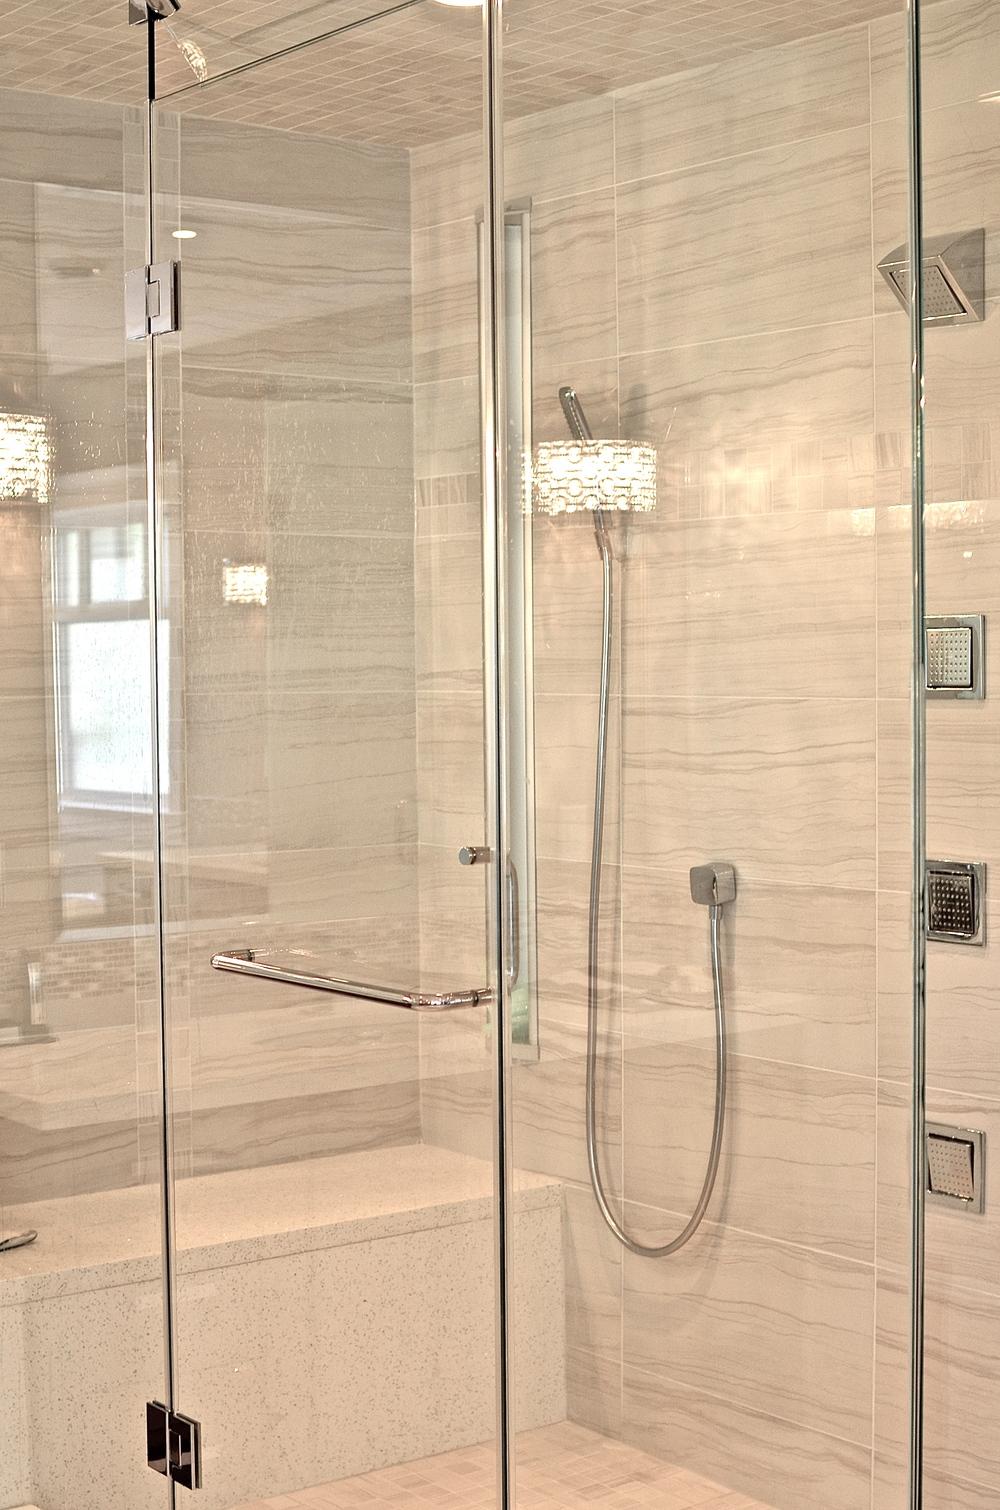 Bathroom designers in vancouver